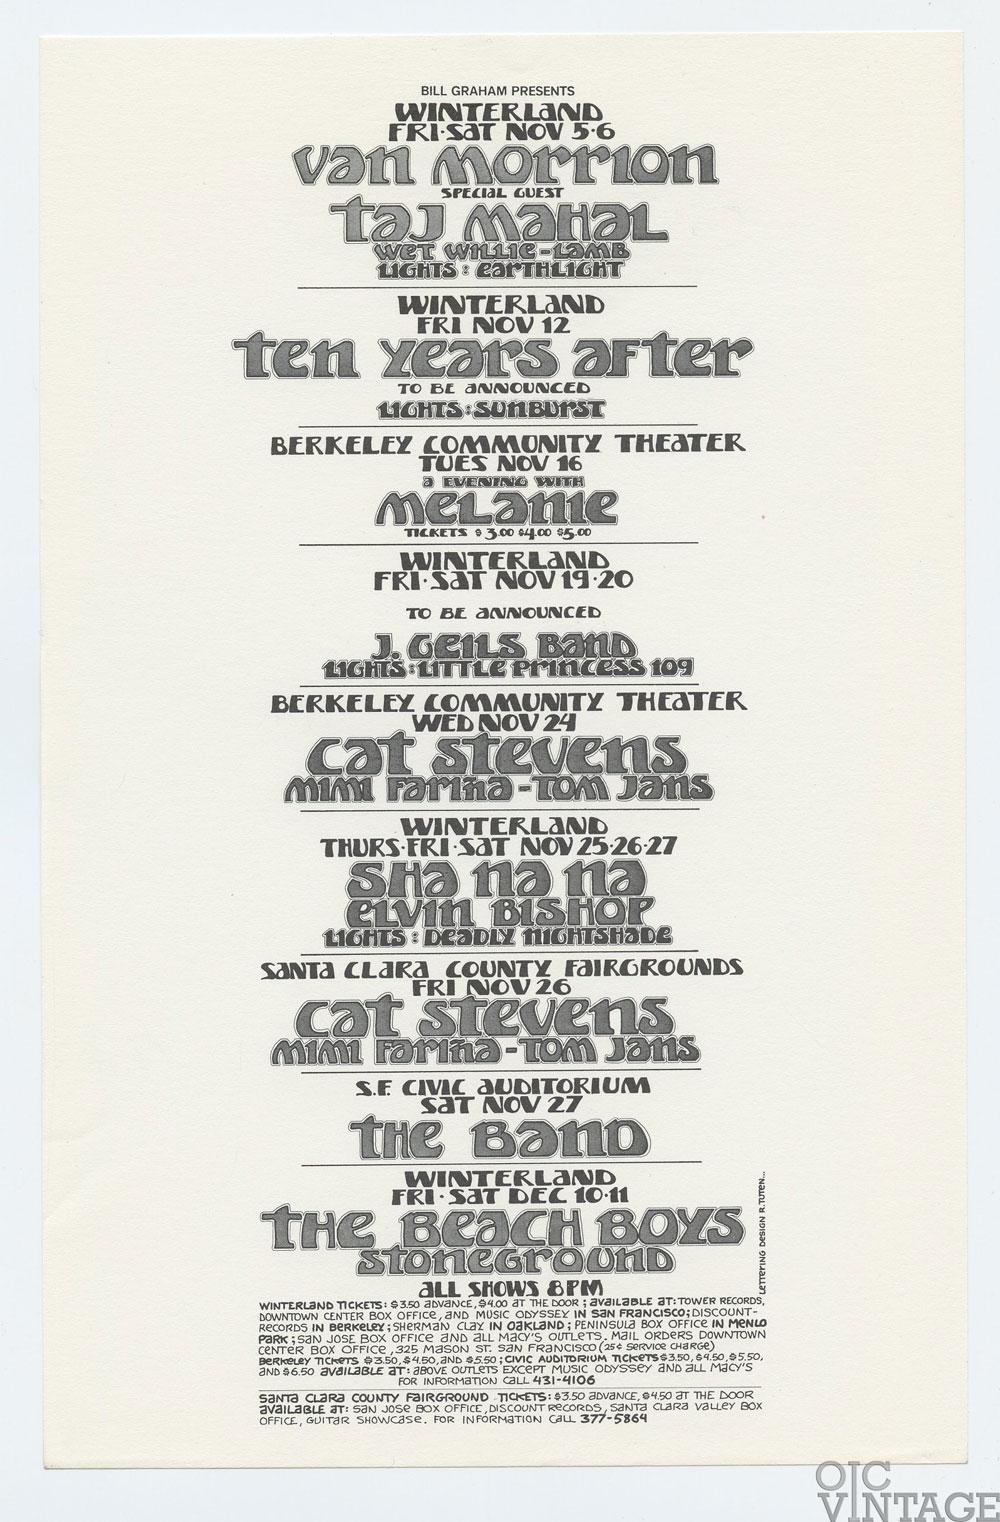 Bill Graham Presents Flyer 1971 Nov Van Morrison The Beach Boys The Band